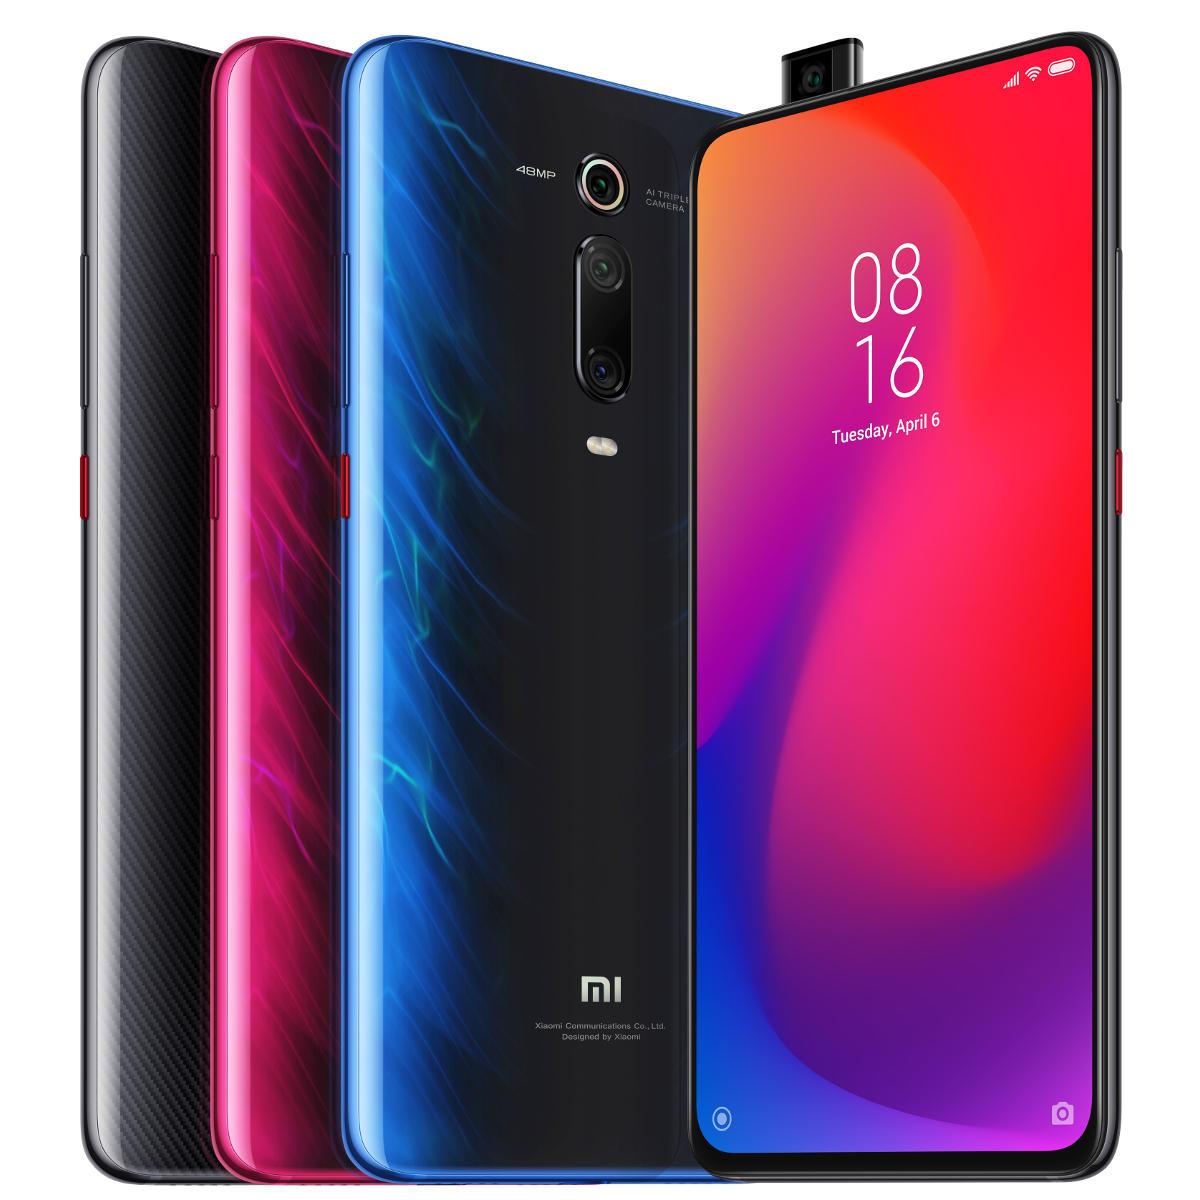 Global Version Xiaomi Mi 9T 6GB RAM 64GB ROM Smartphone £182.34 delivered (using code) @ AliExpress / Xiaomi Online Store